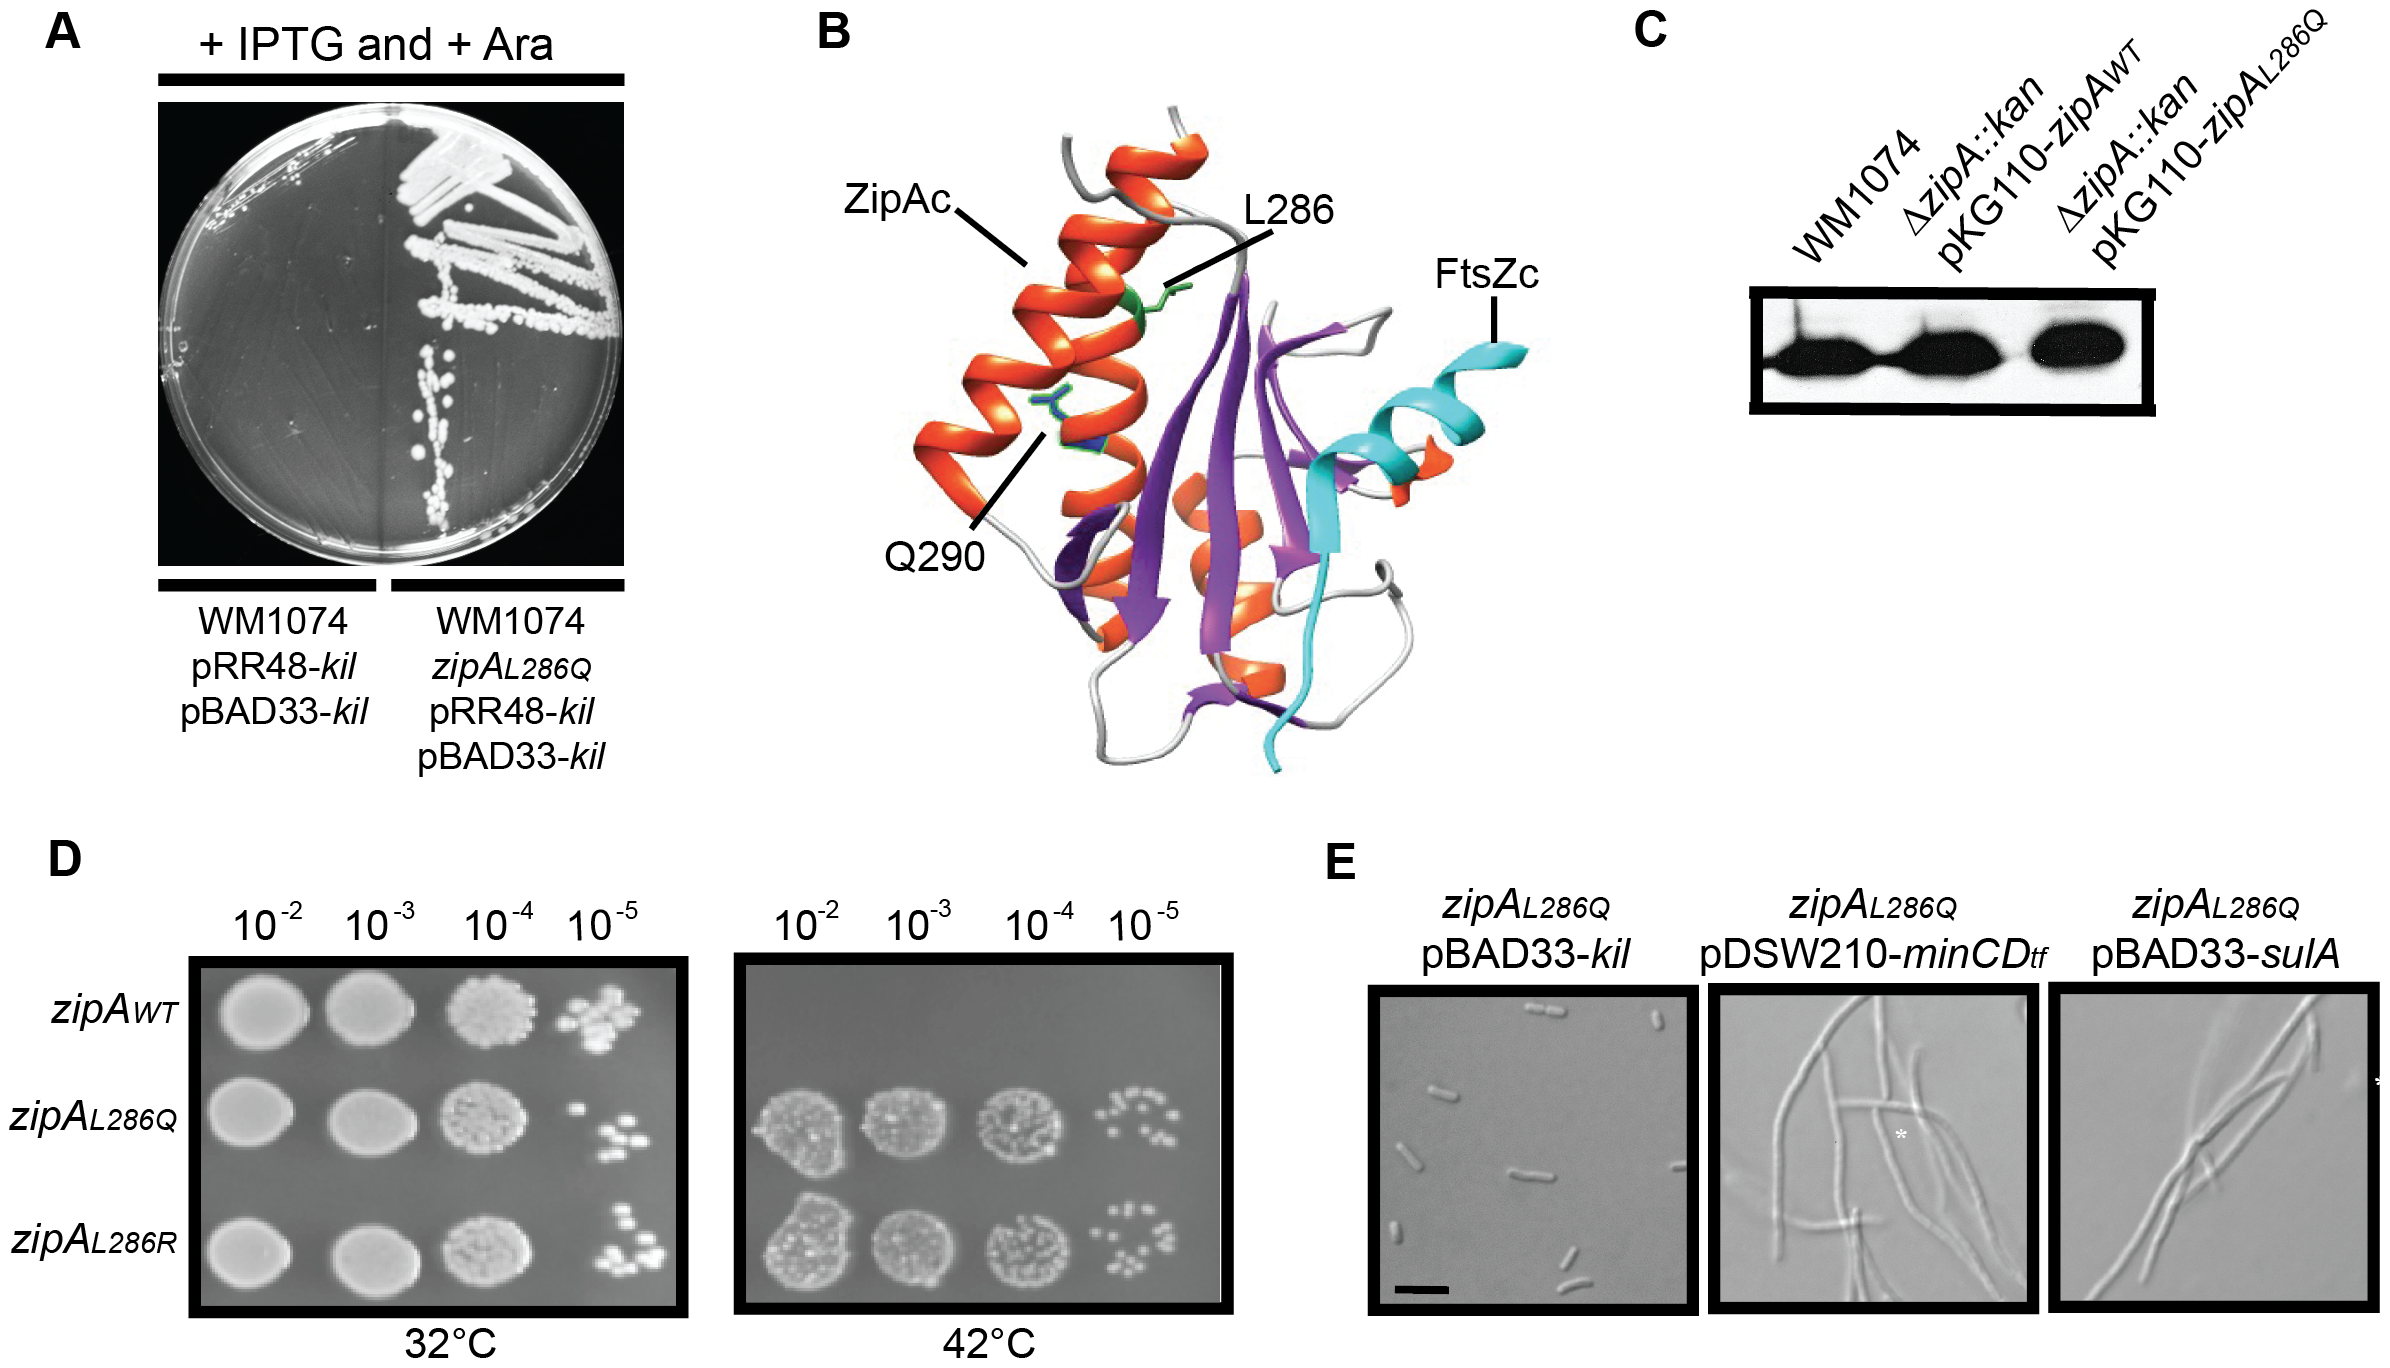 Isolation and characterization of Kil-resistant <i>zipA</i> alleles.